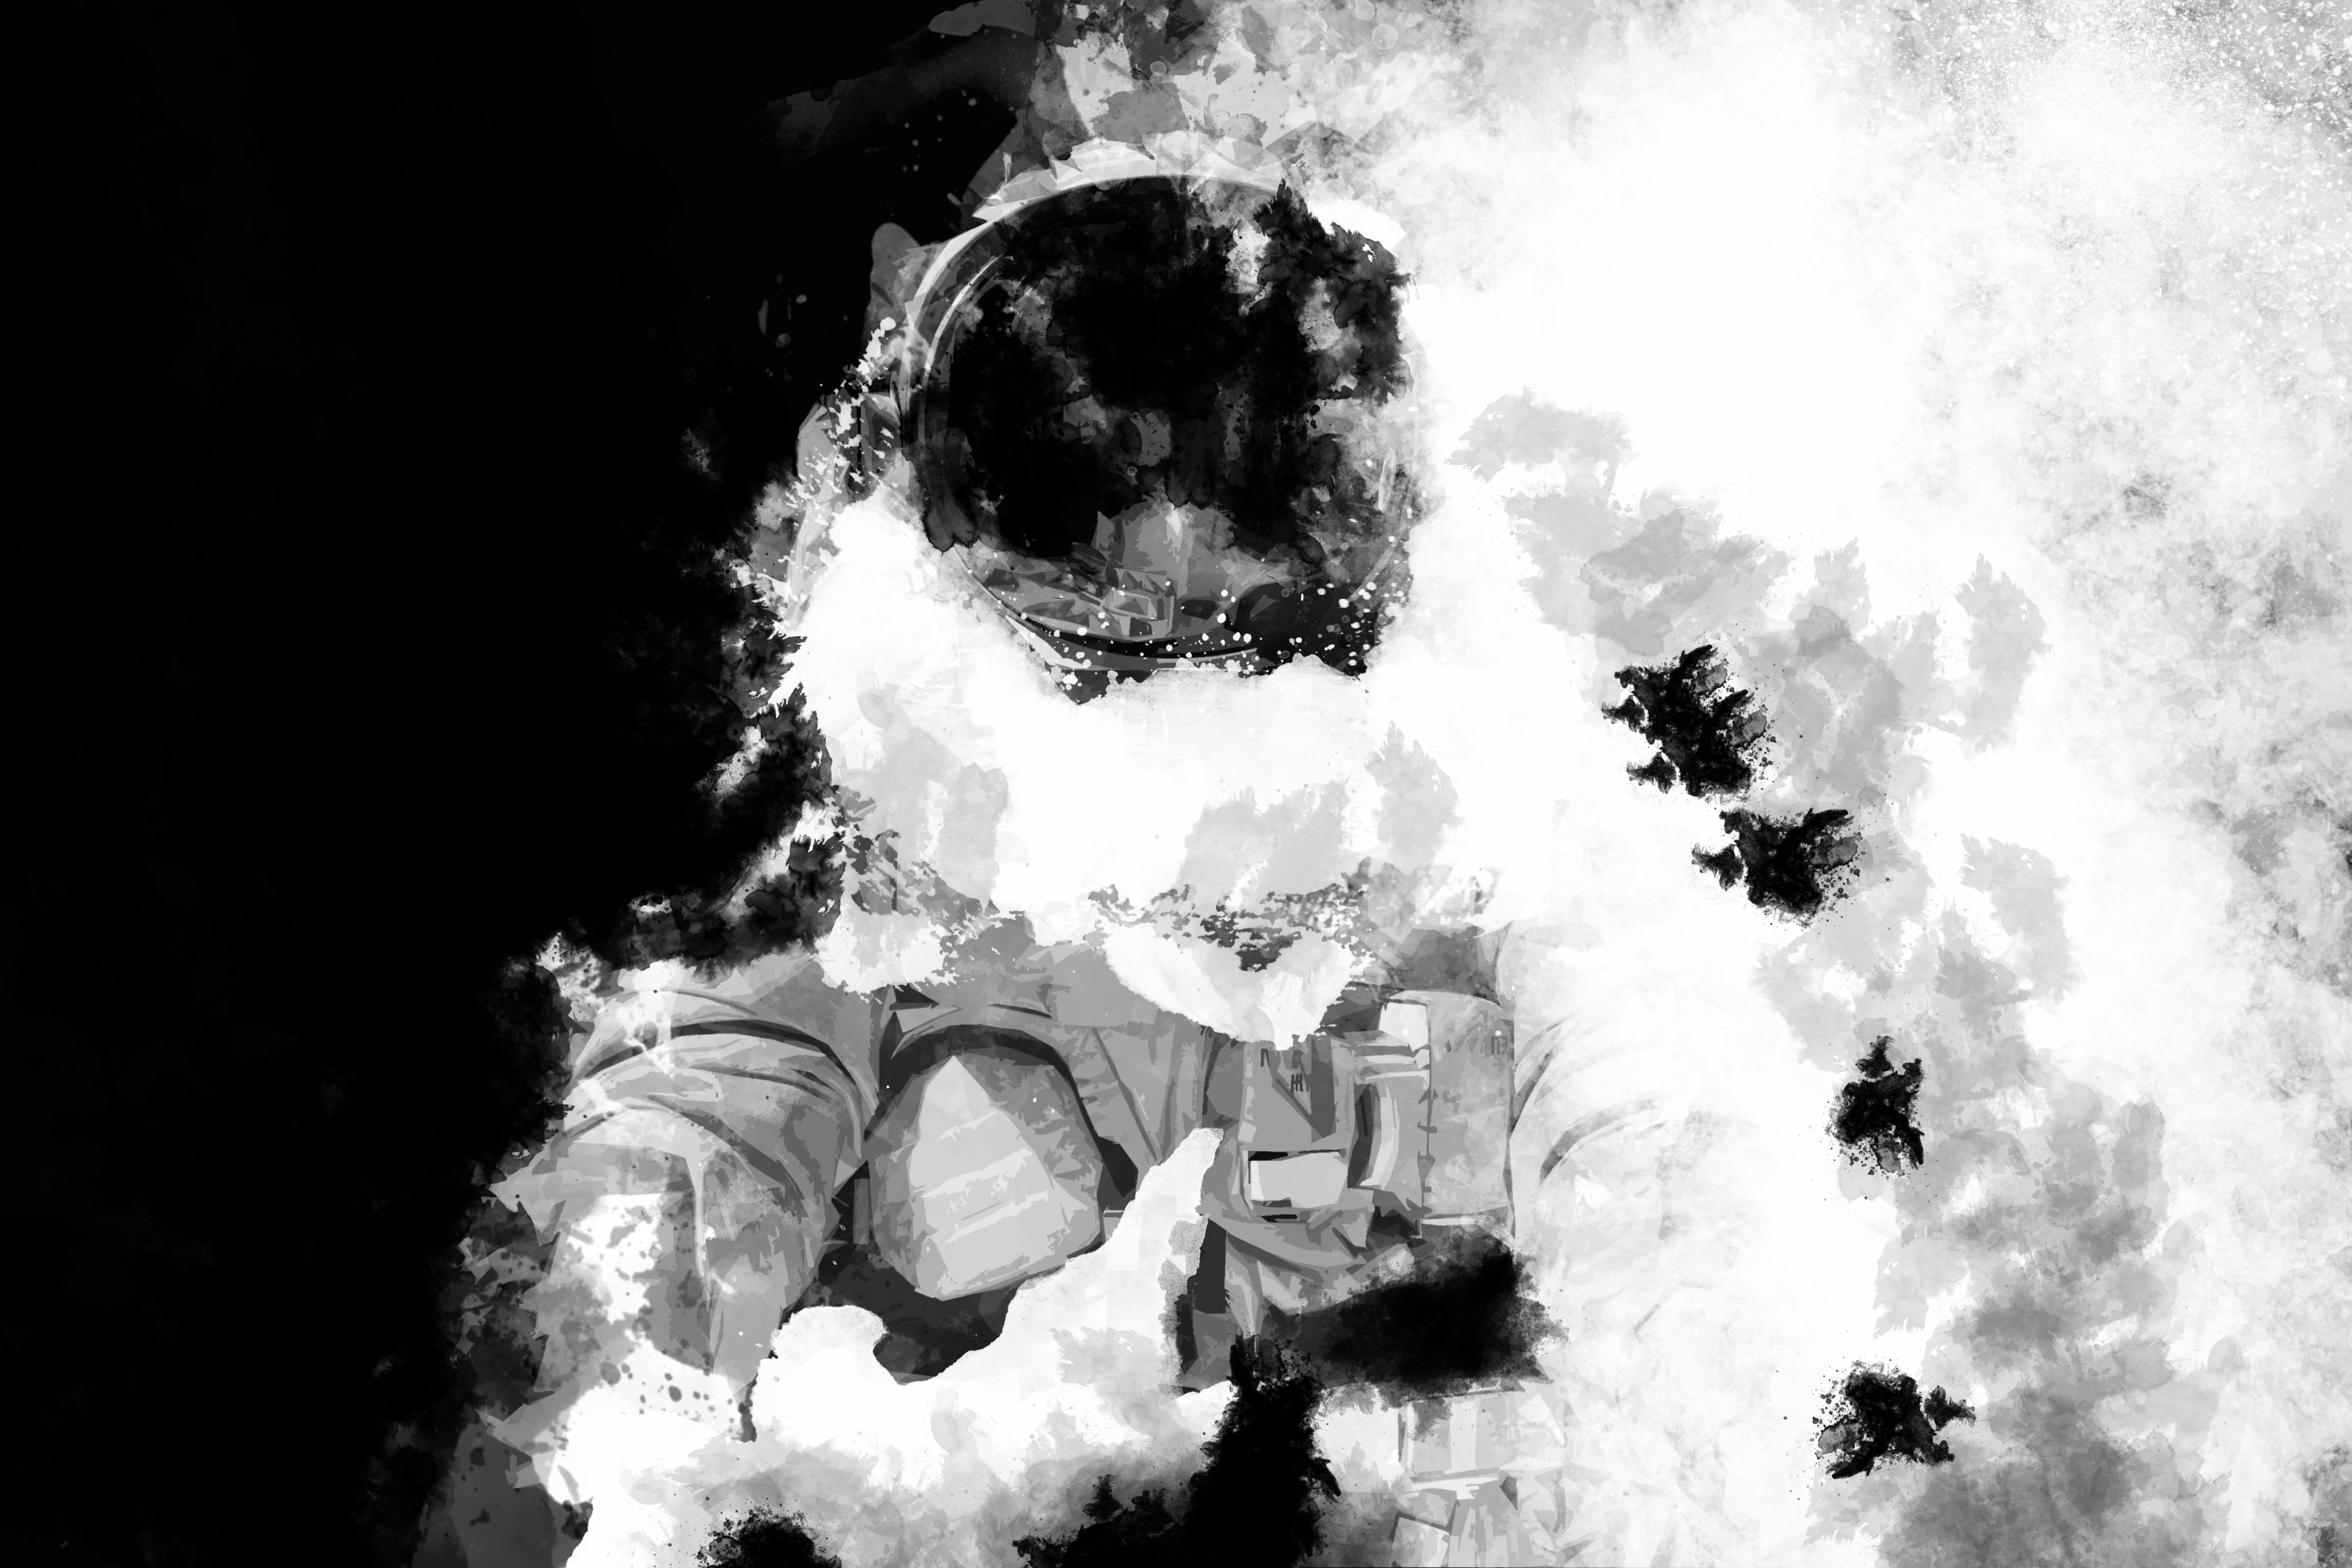 Astro-Soldier1stt.png